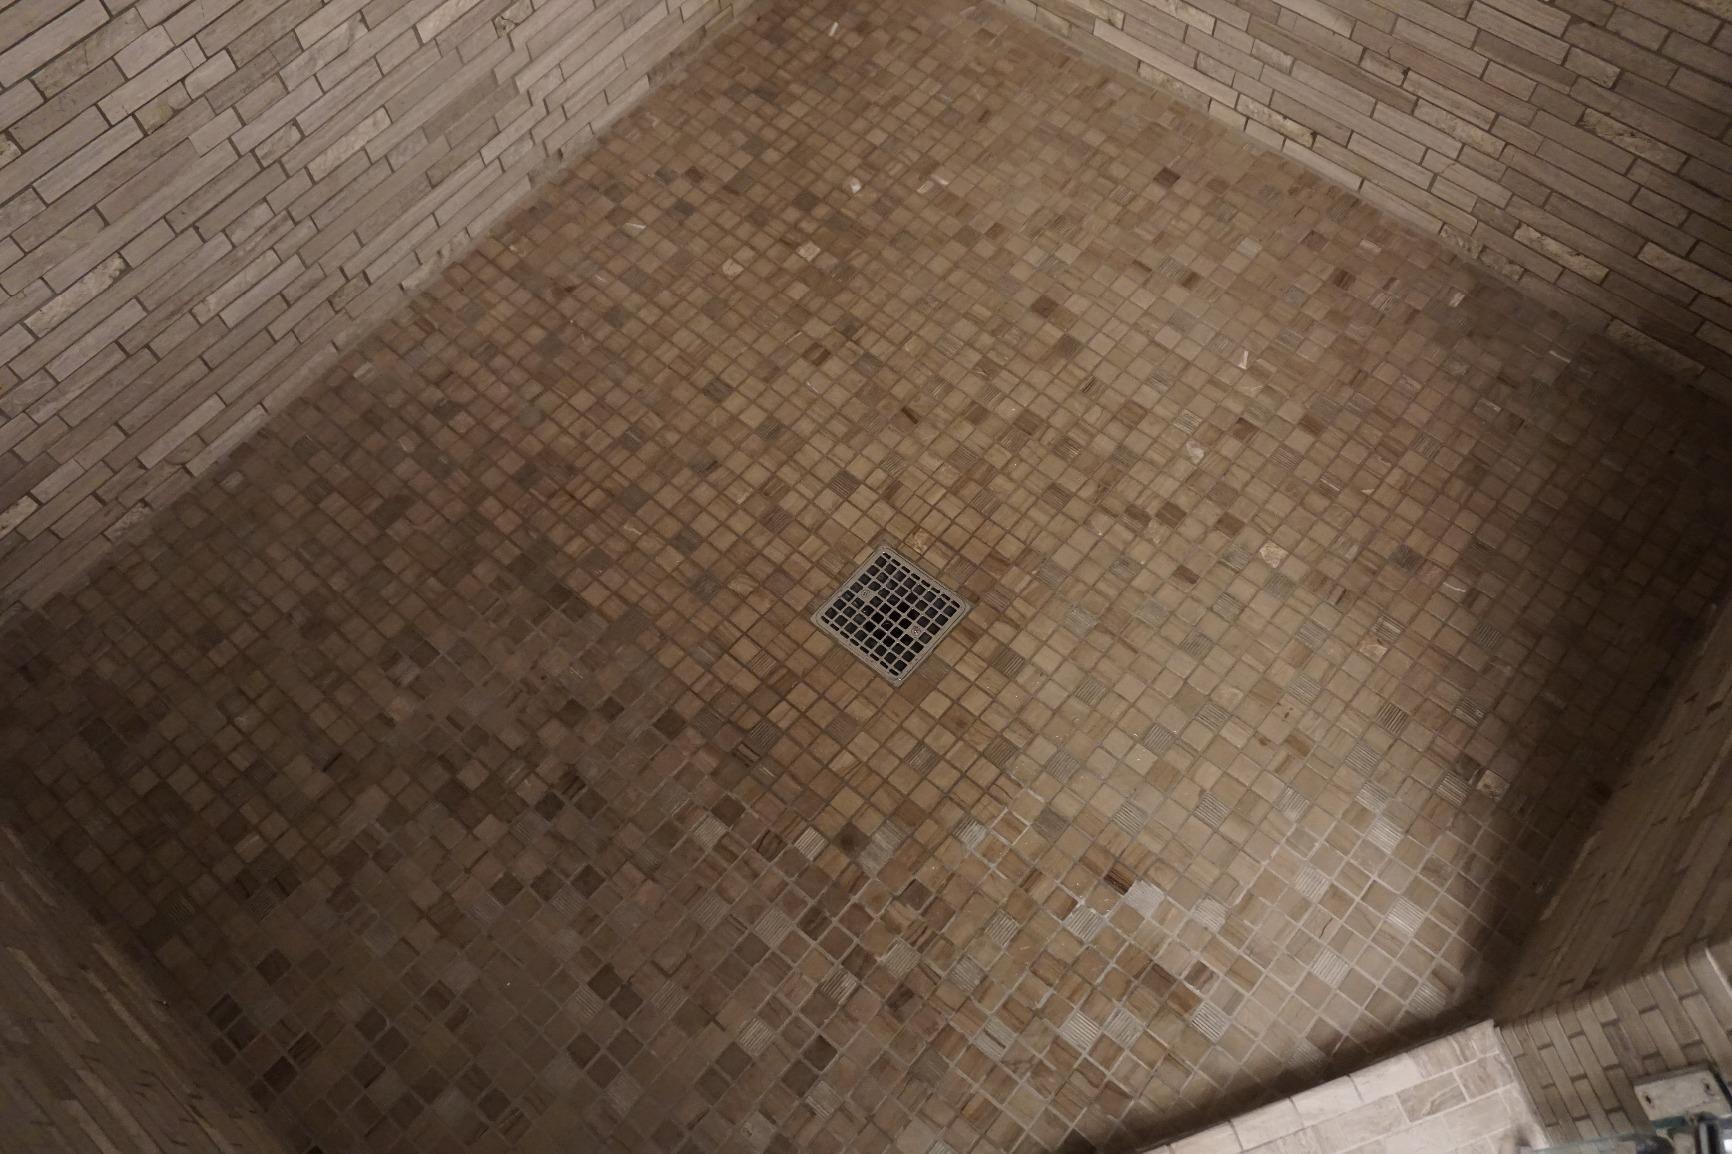 This KOHLER K 9136 CP Square Design Tile In Shower Drain Fits The